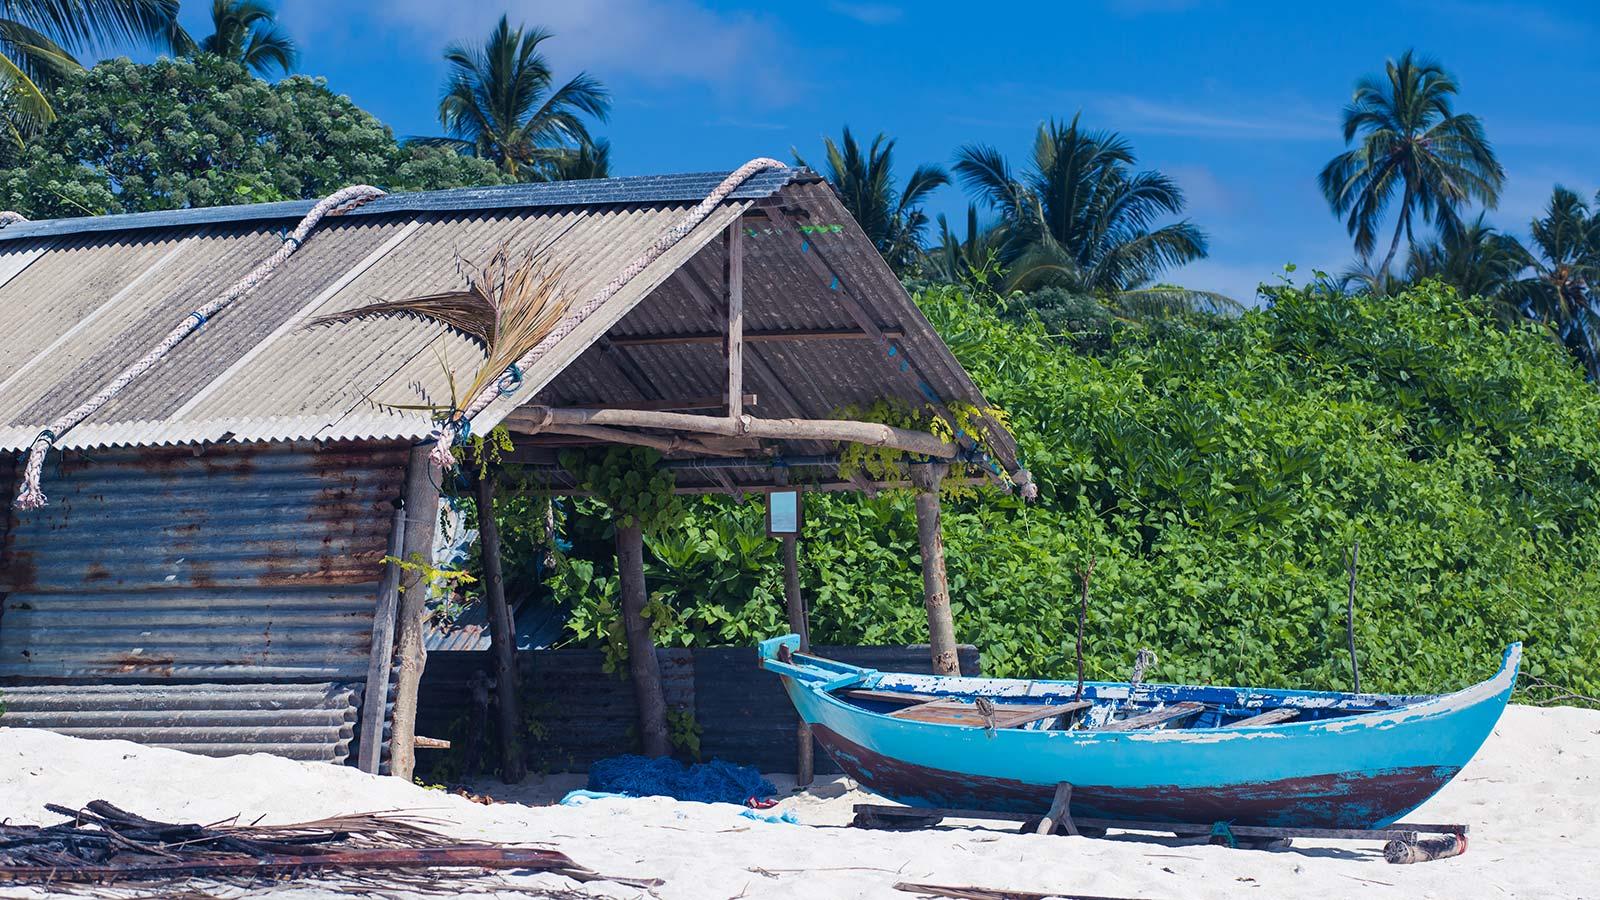 Local Island Mahibadhoo